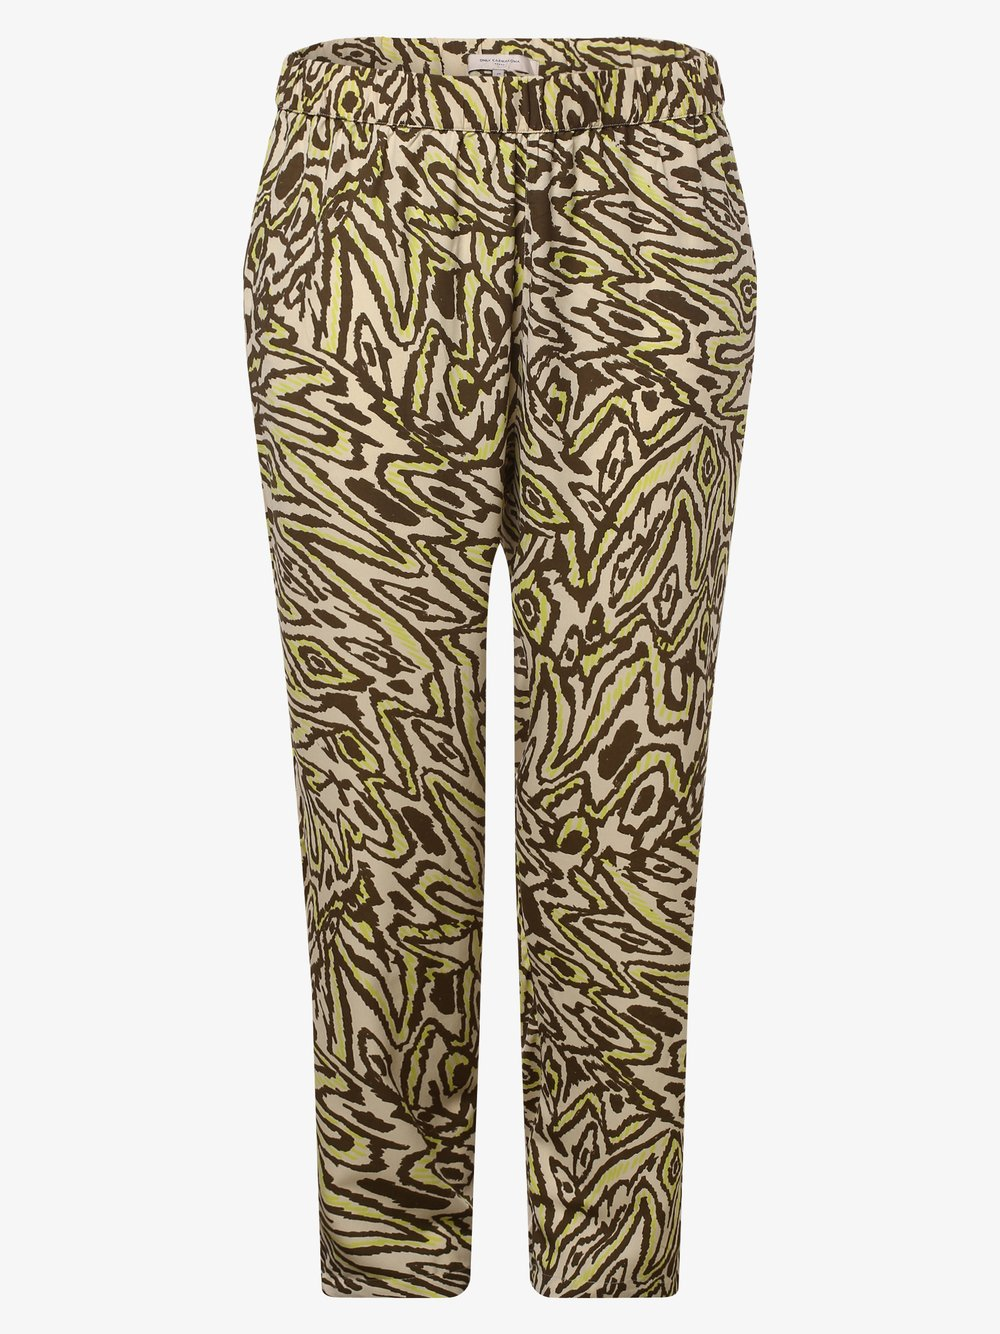 ONLY Carmakoma – Spodnie damskie – Cartriple, beżowy Van Graaf 476899-0001-00500